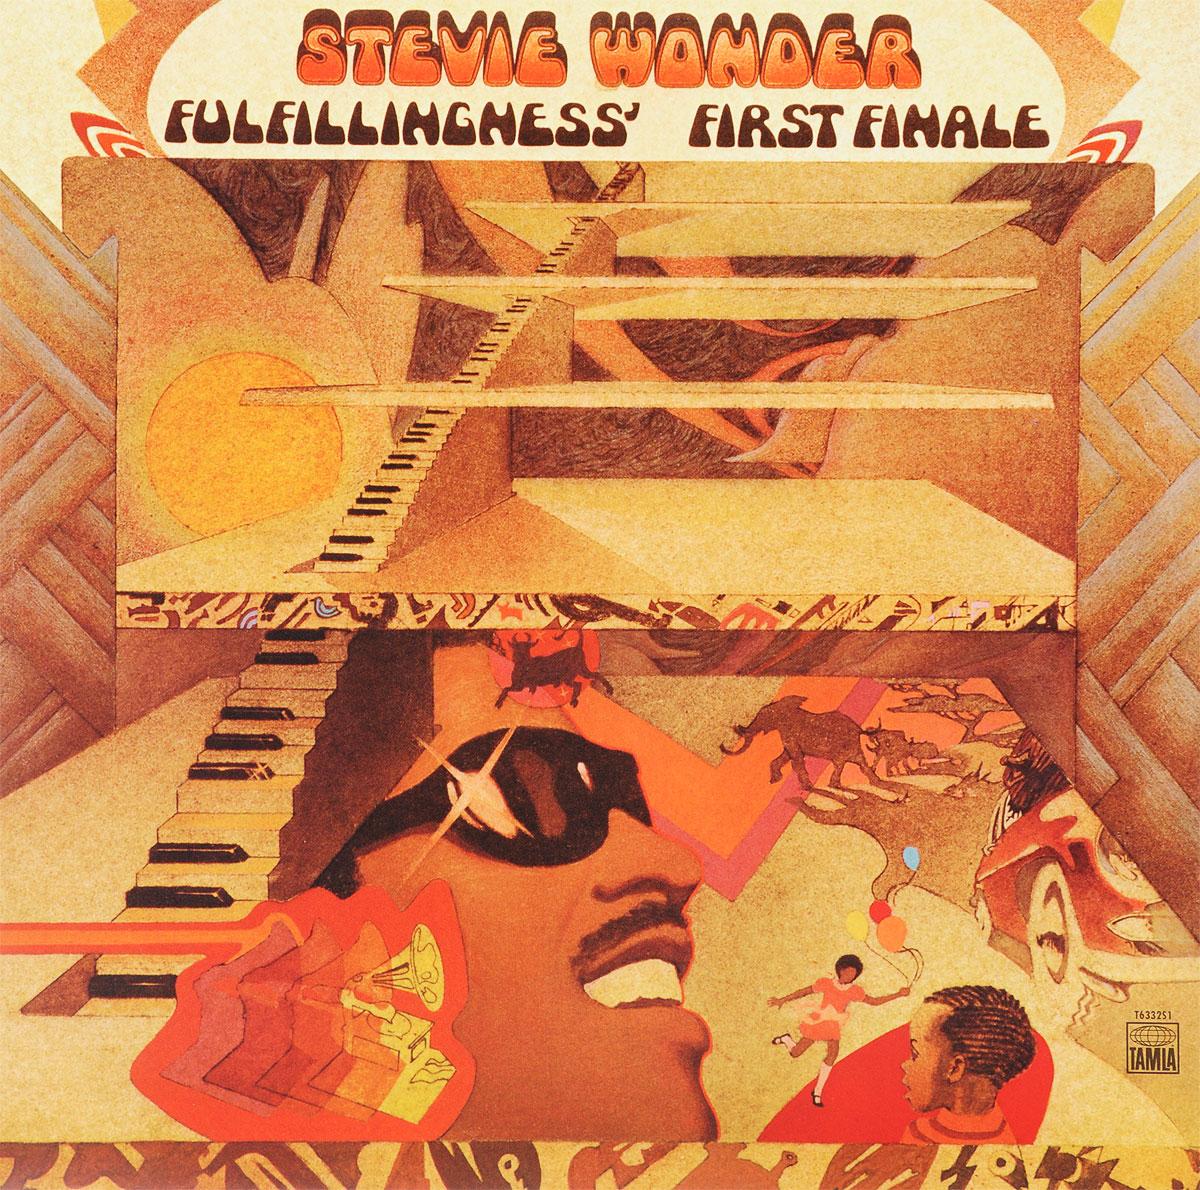 Стиви Уандер Stevie Wonder. Fulfillingness' First Finale (LP) стиви уандер stevie wonder fulfillingness first finale